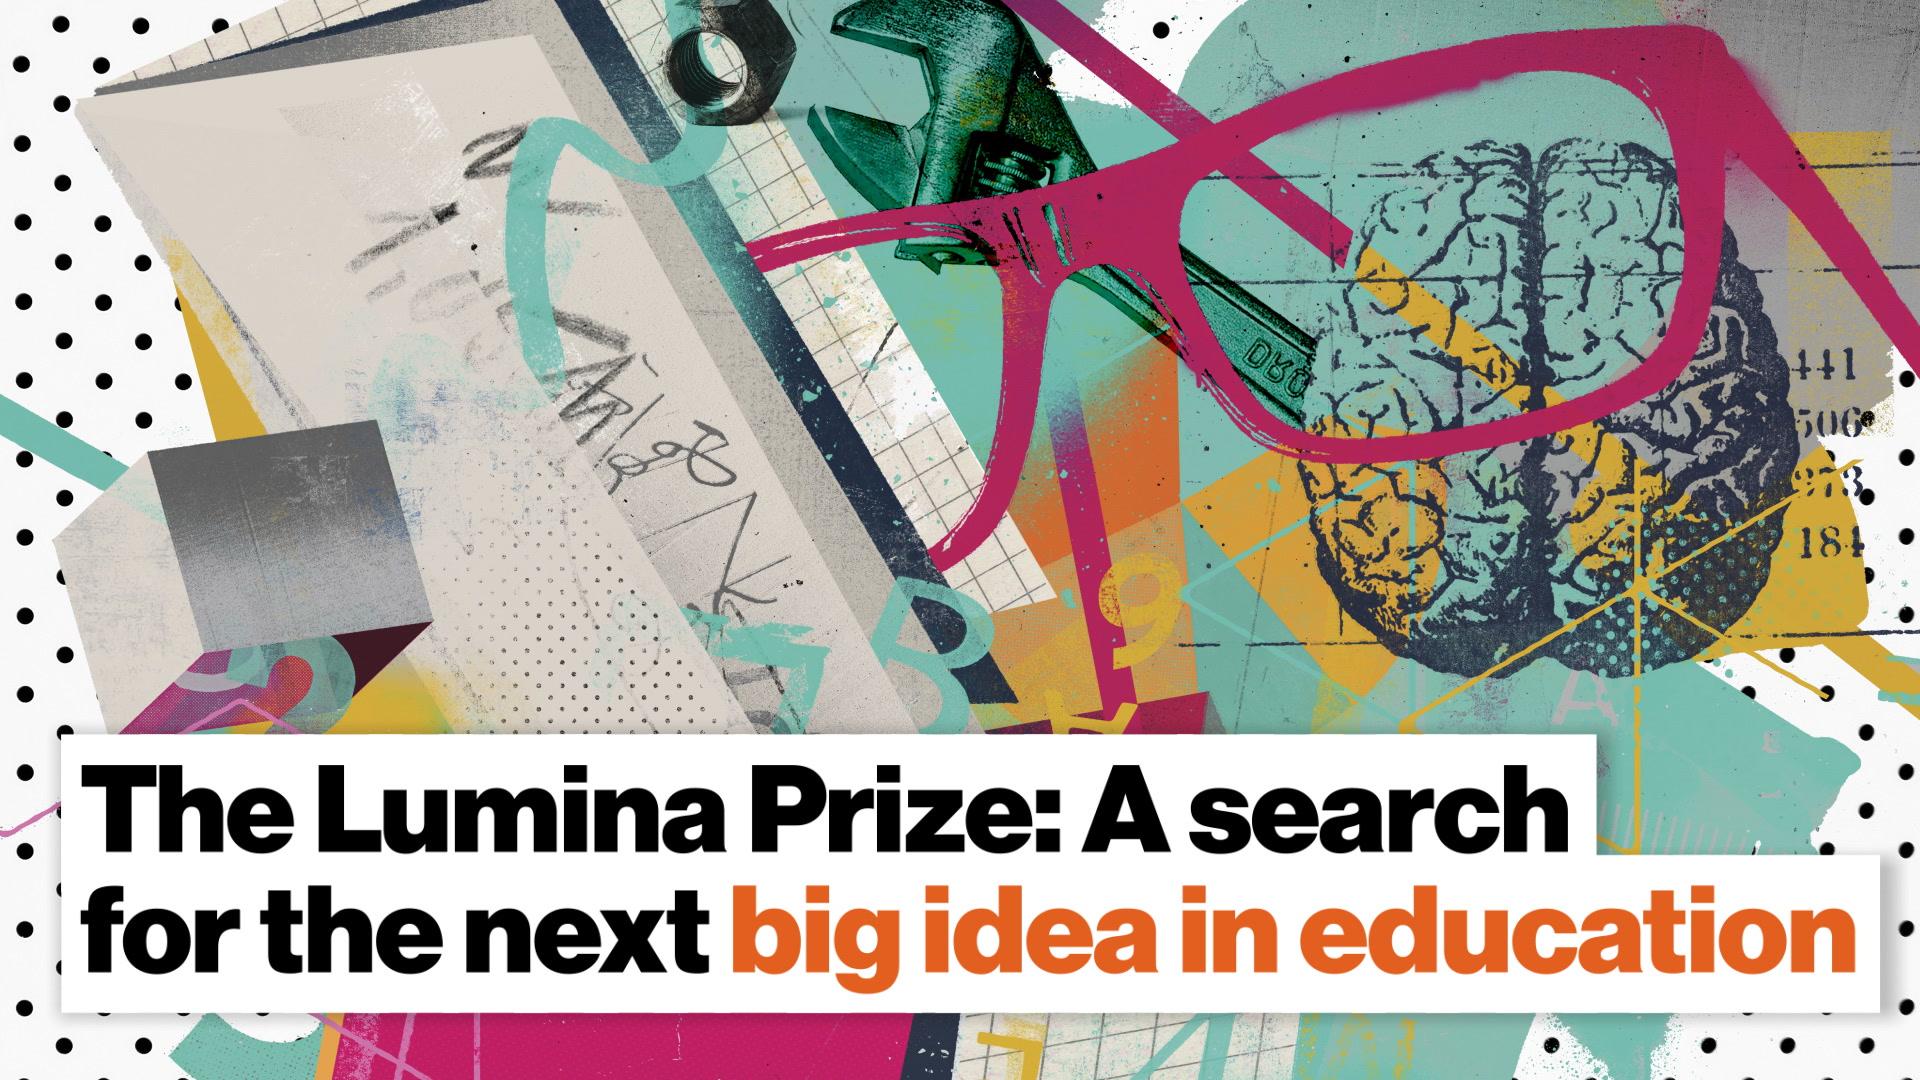 Big Think - Sponsored by Lumina Foundation